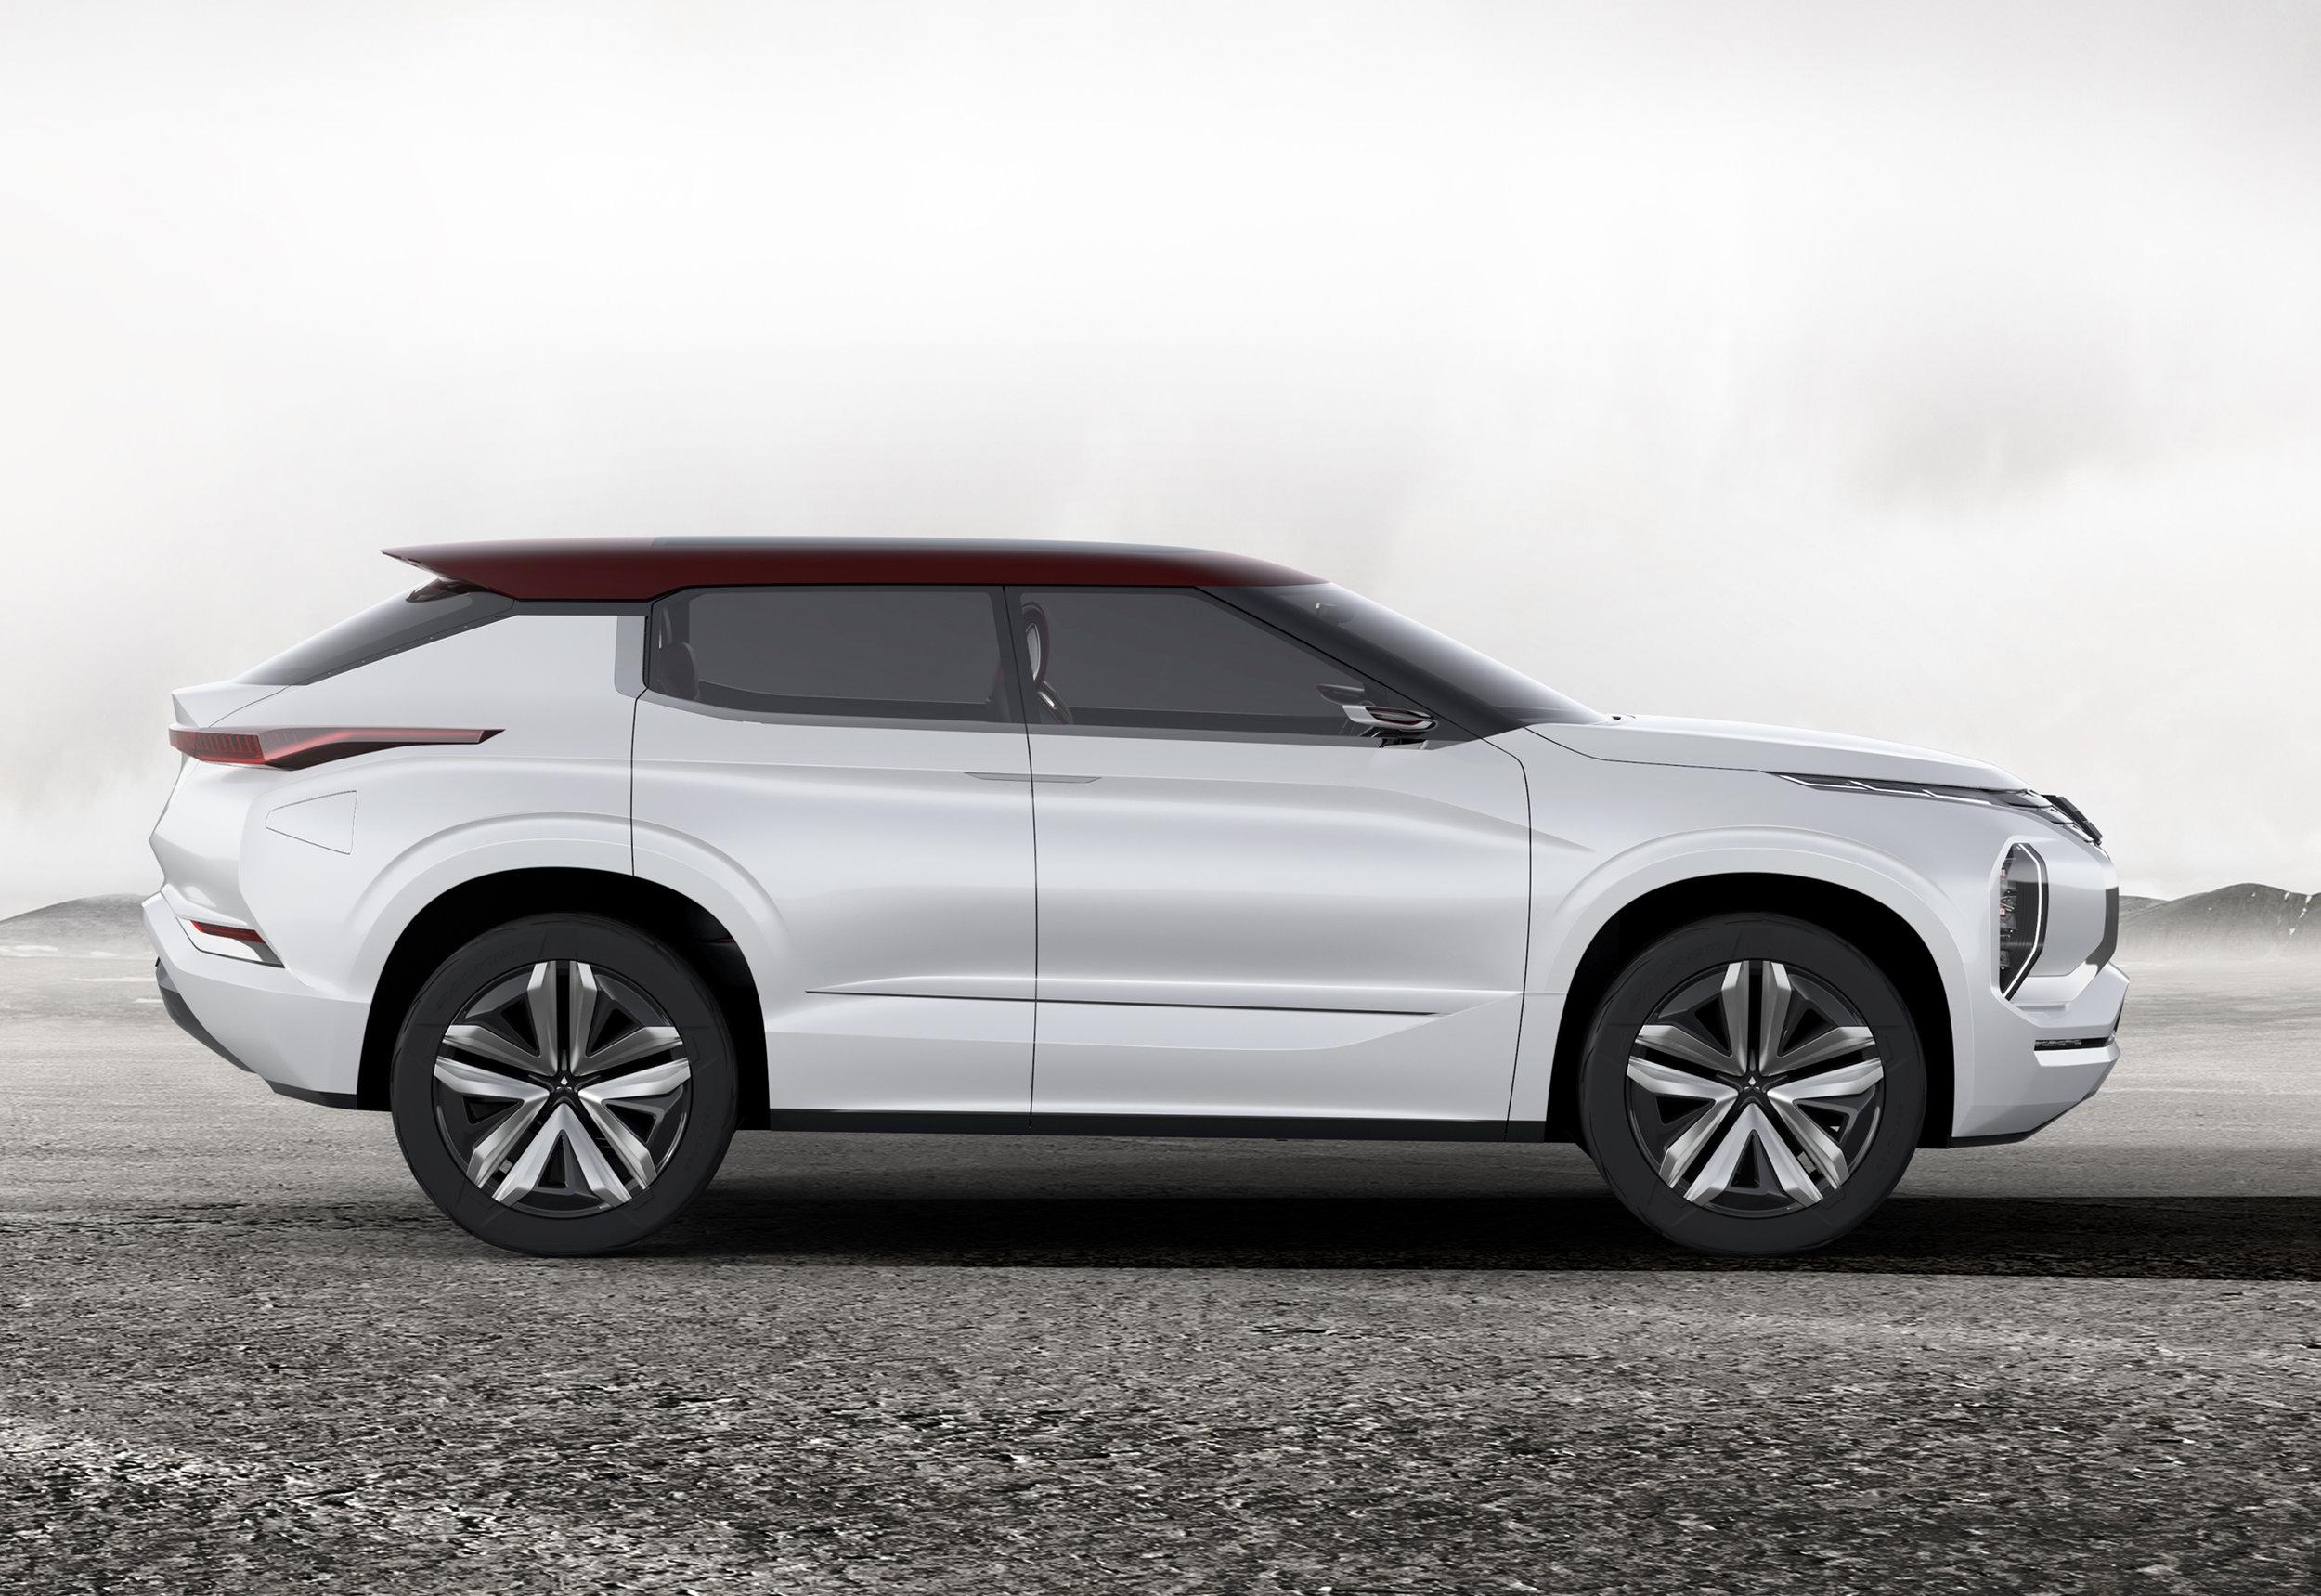 3World-Premiere-of-Ground-Tourer-SUV-Mitsubishi-GT-PHEV-Concept.jpg